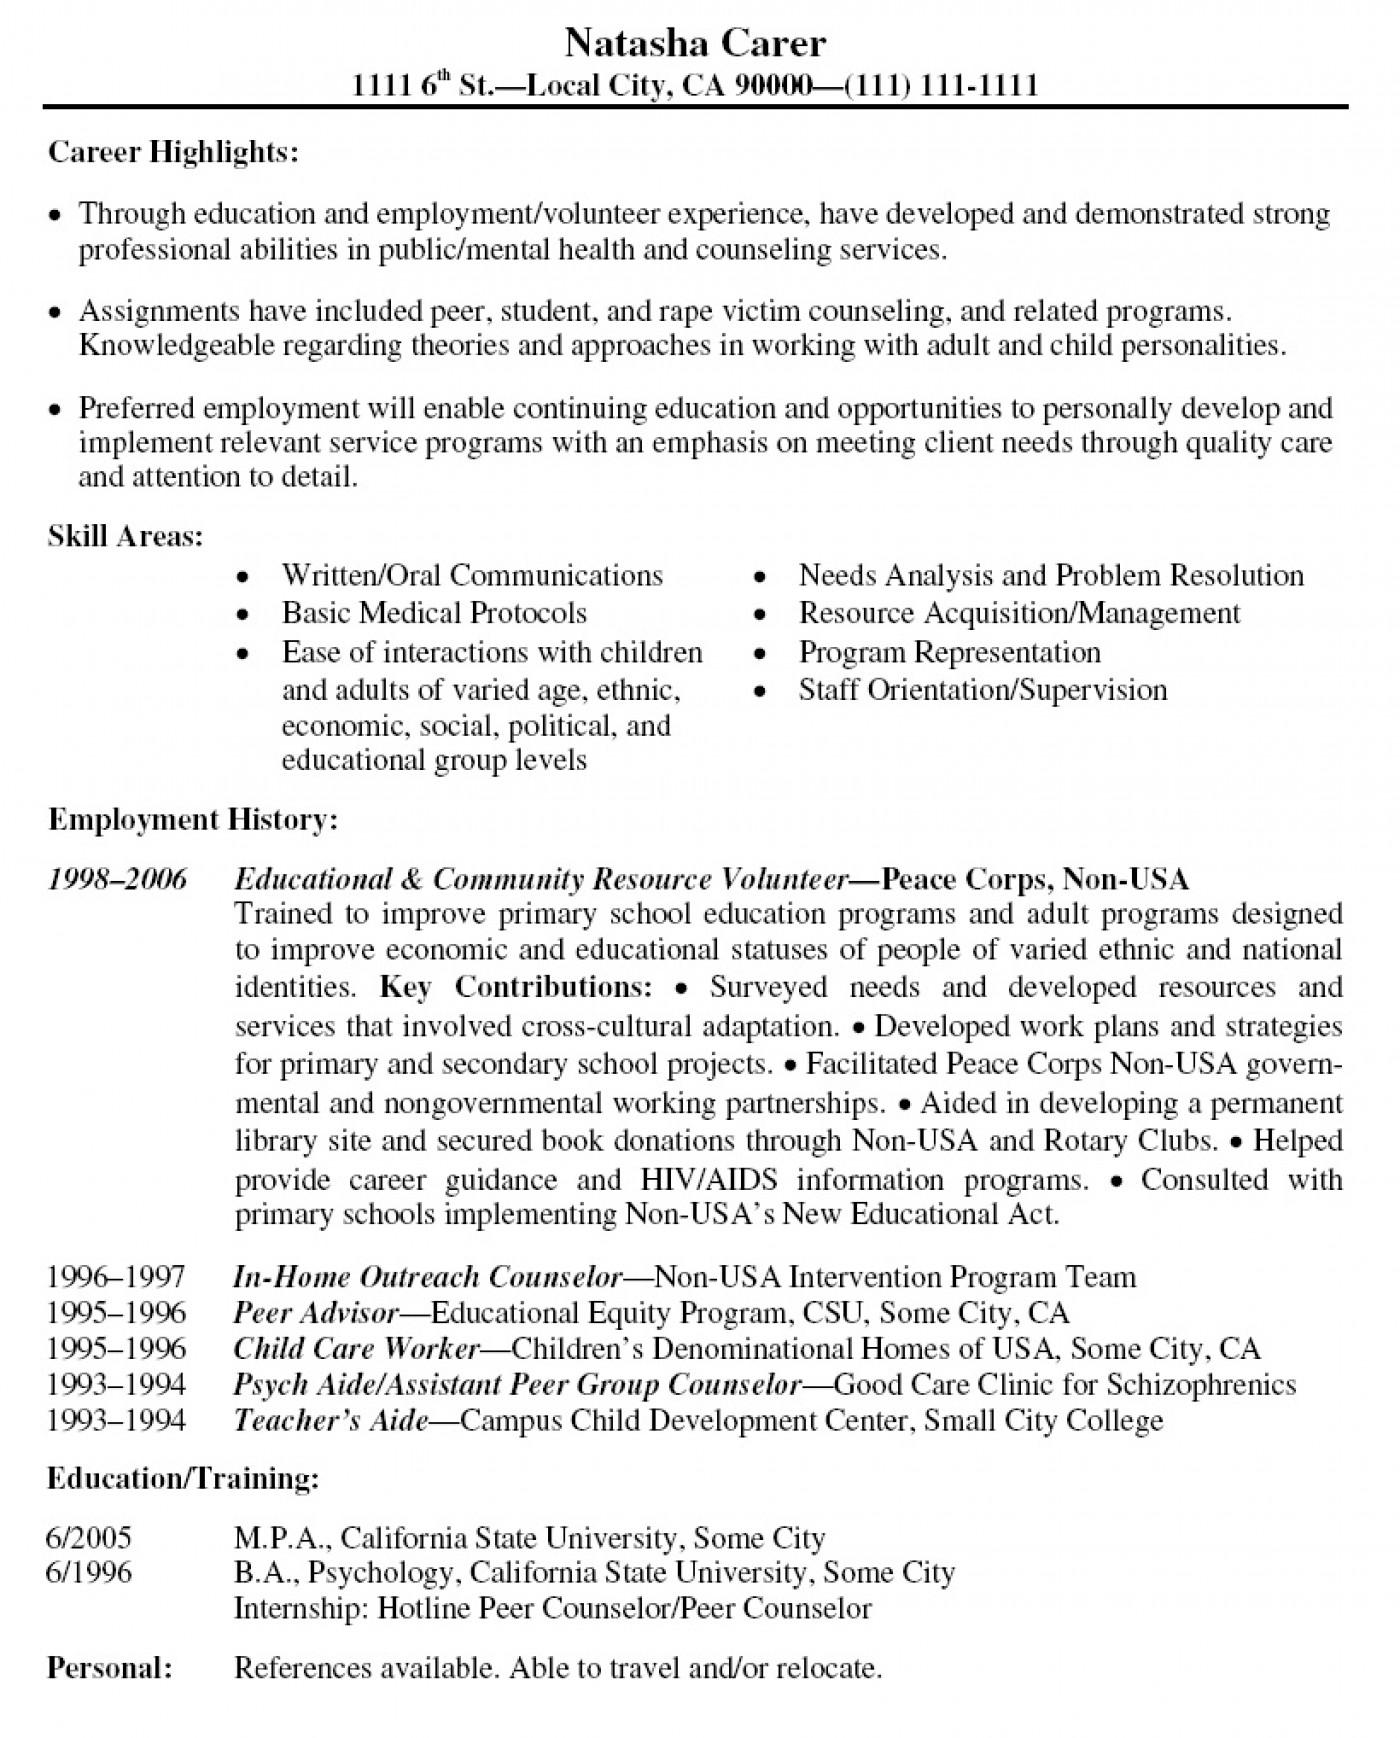 001 Volunteer Experience Essay Resume Example Latest Format L